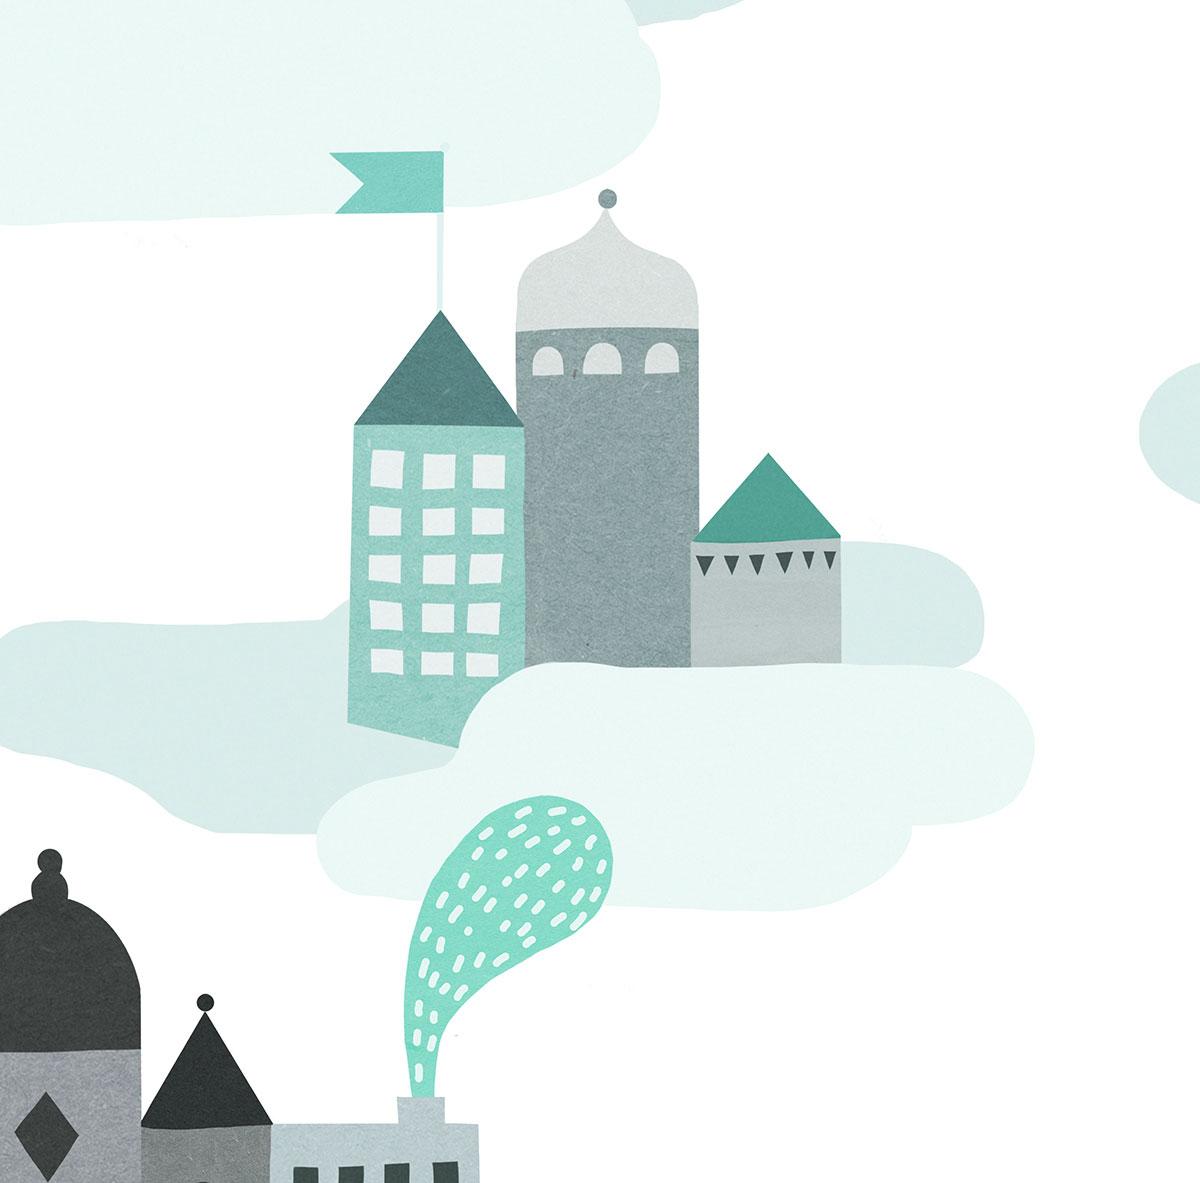 Michelle-Carlslund-Photowall-Sky-city-pattern